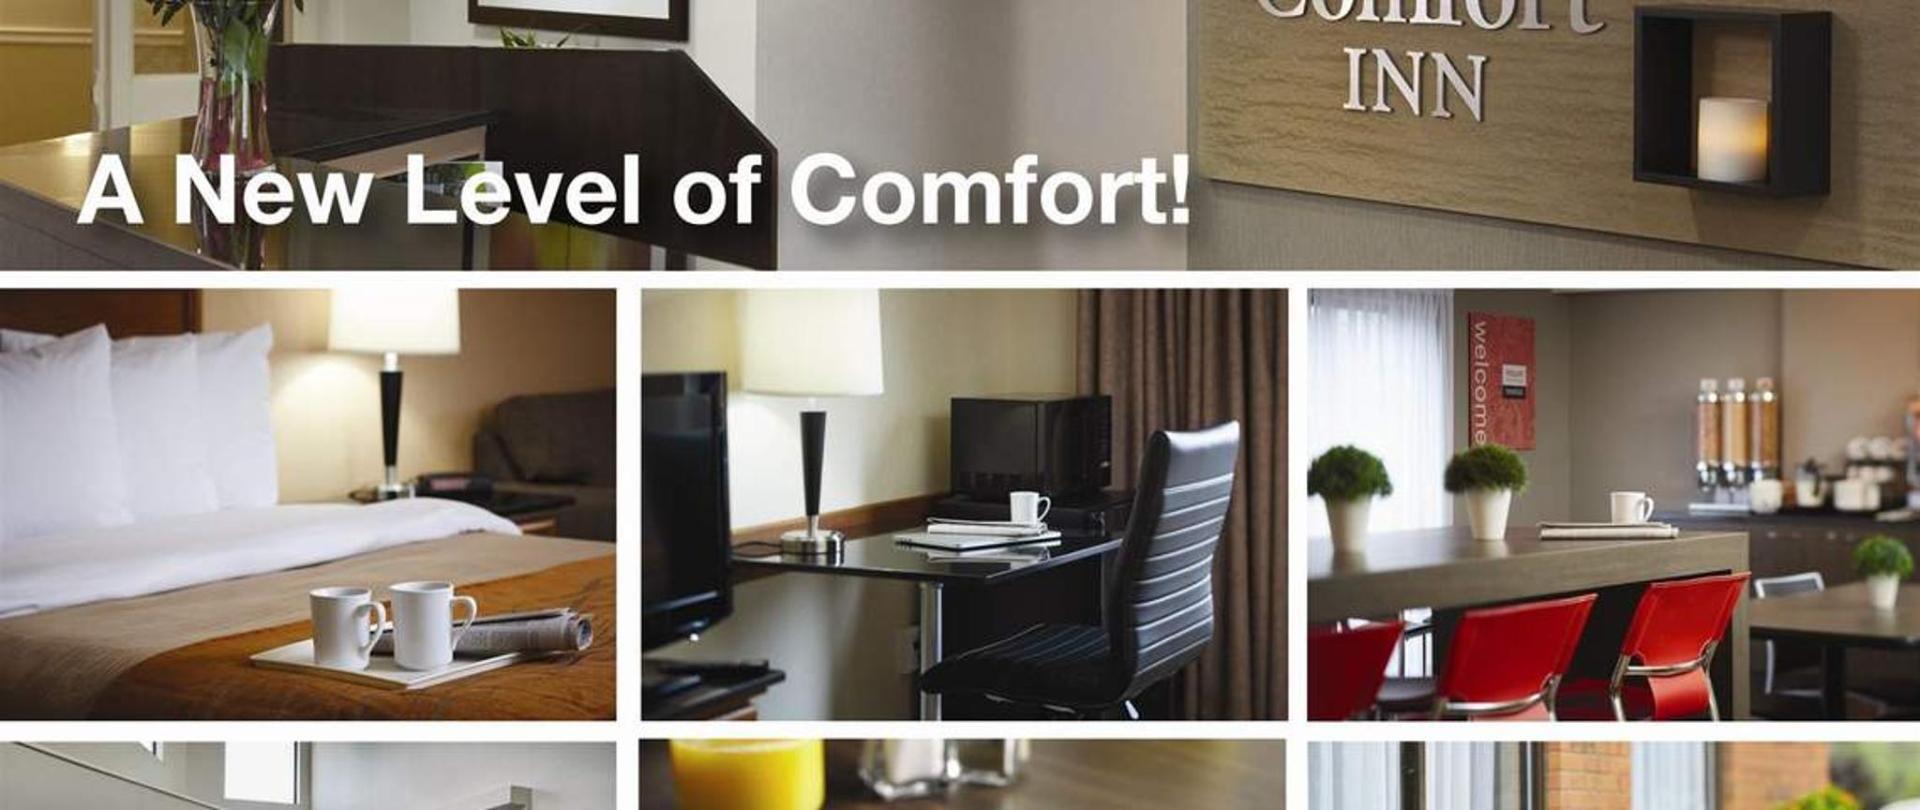 a-new-of-level-comfort.jpg.1140x481_default.jpg